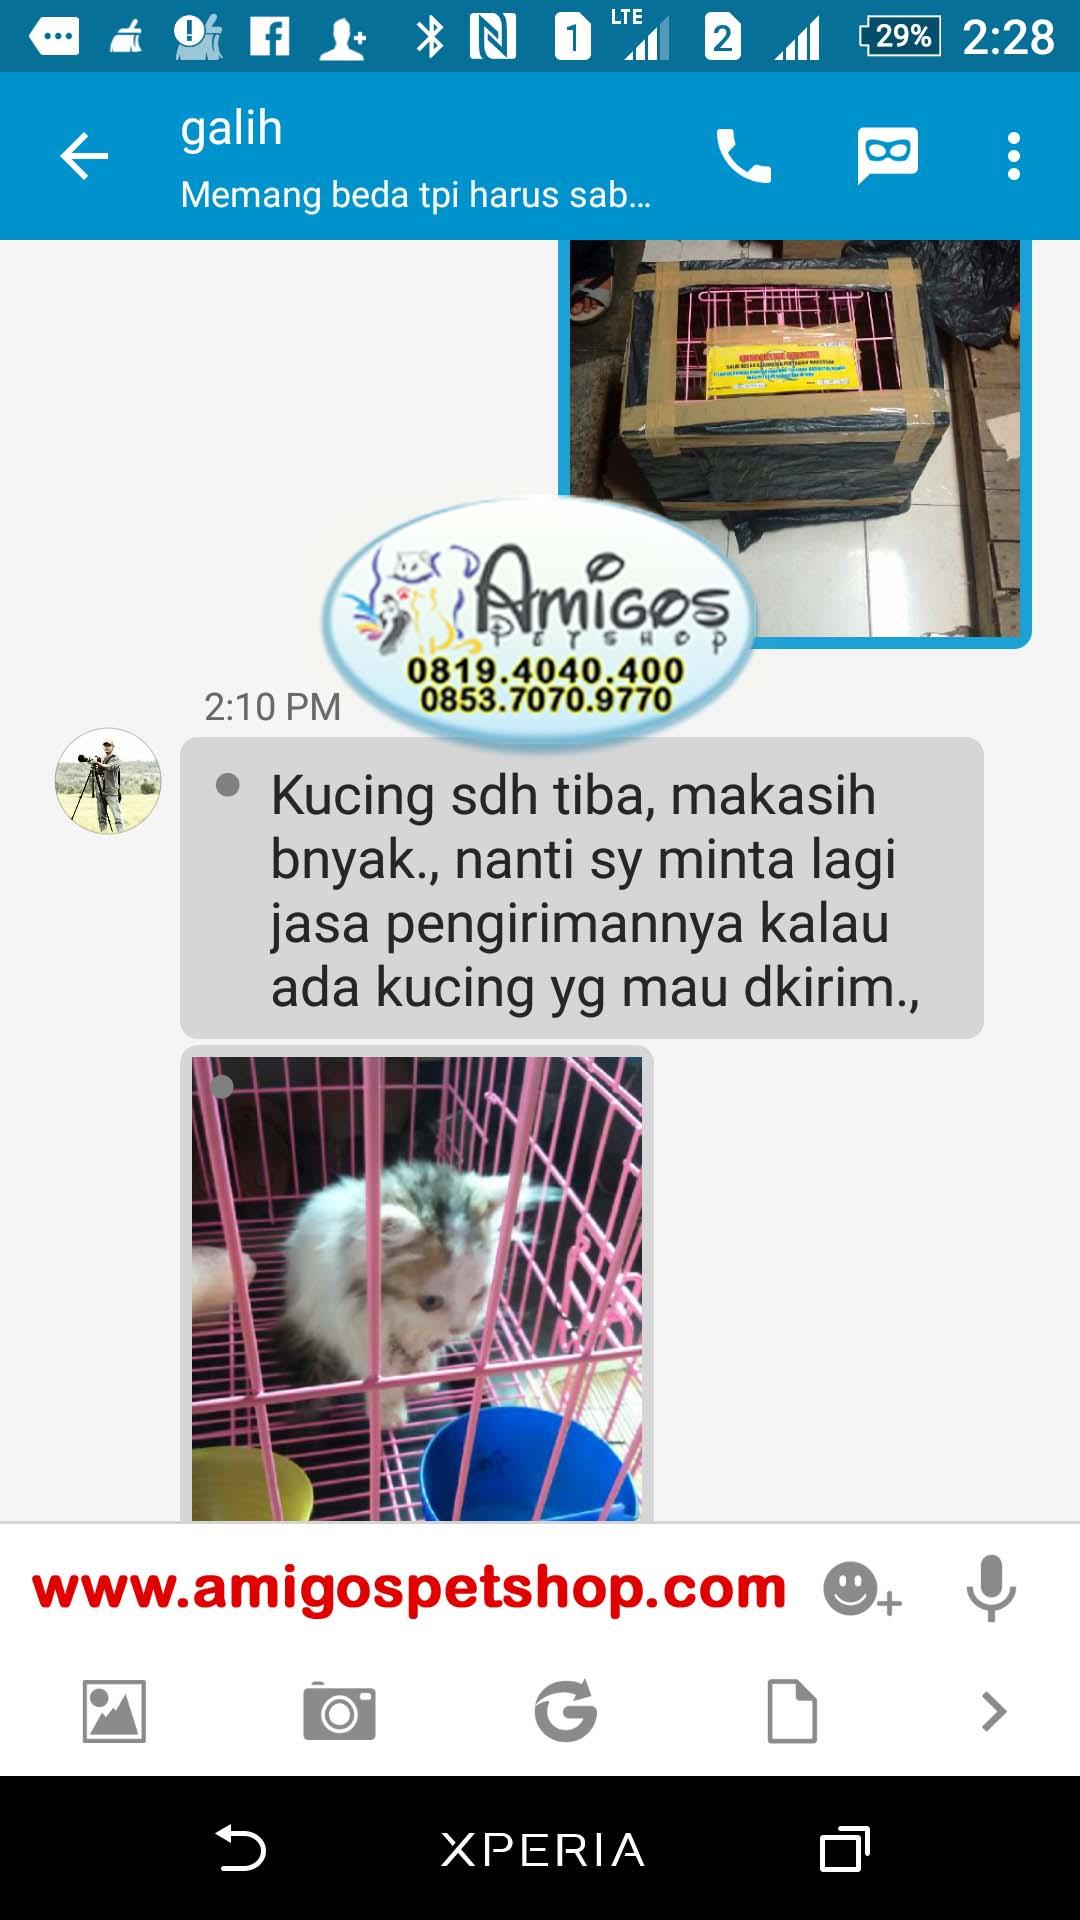 Testimoni pengiriman kucing